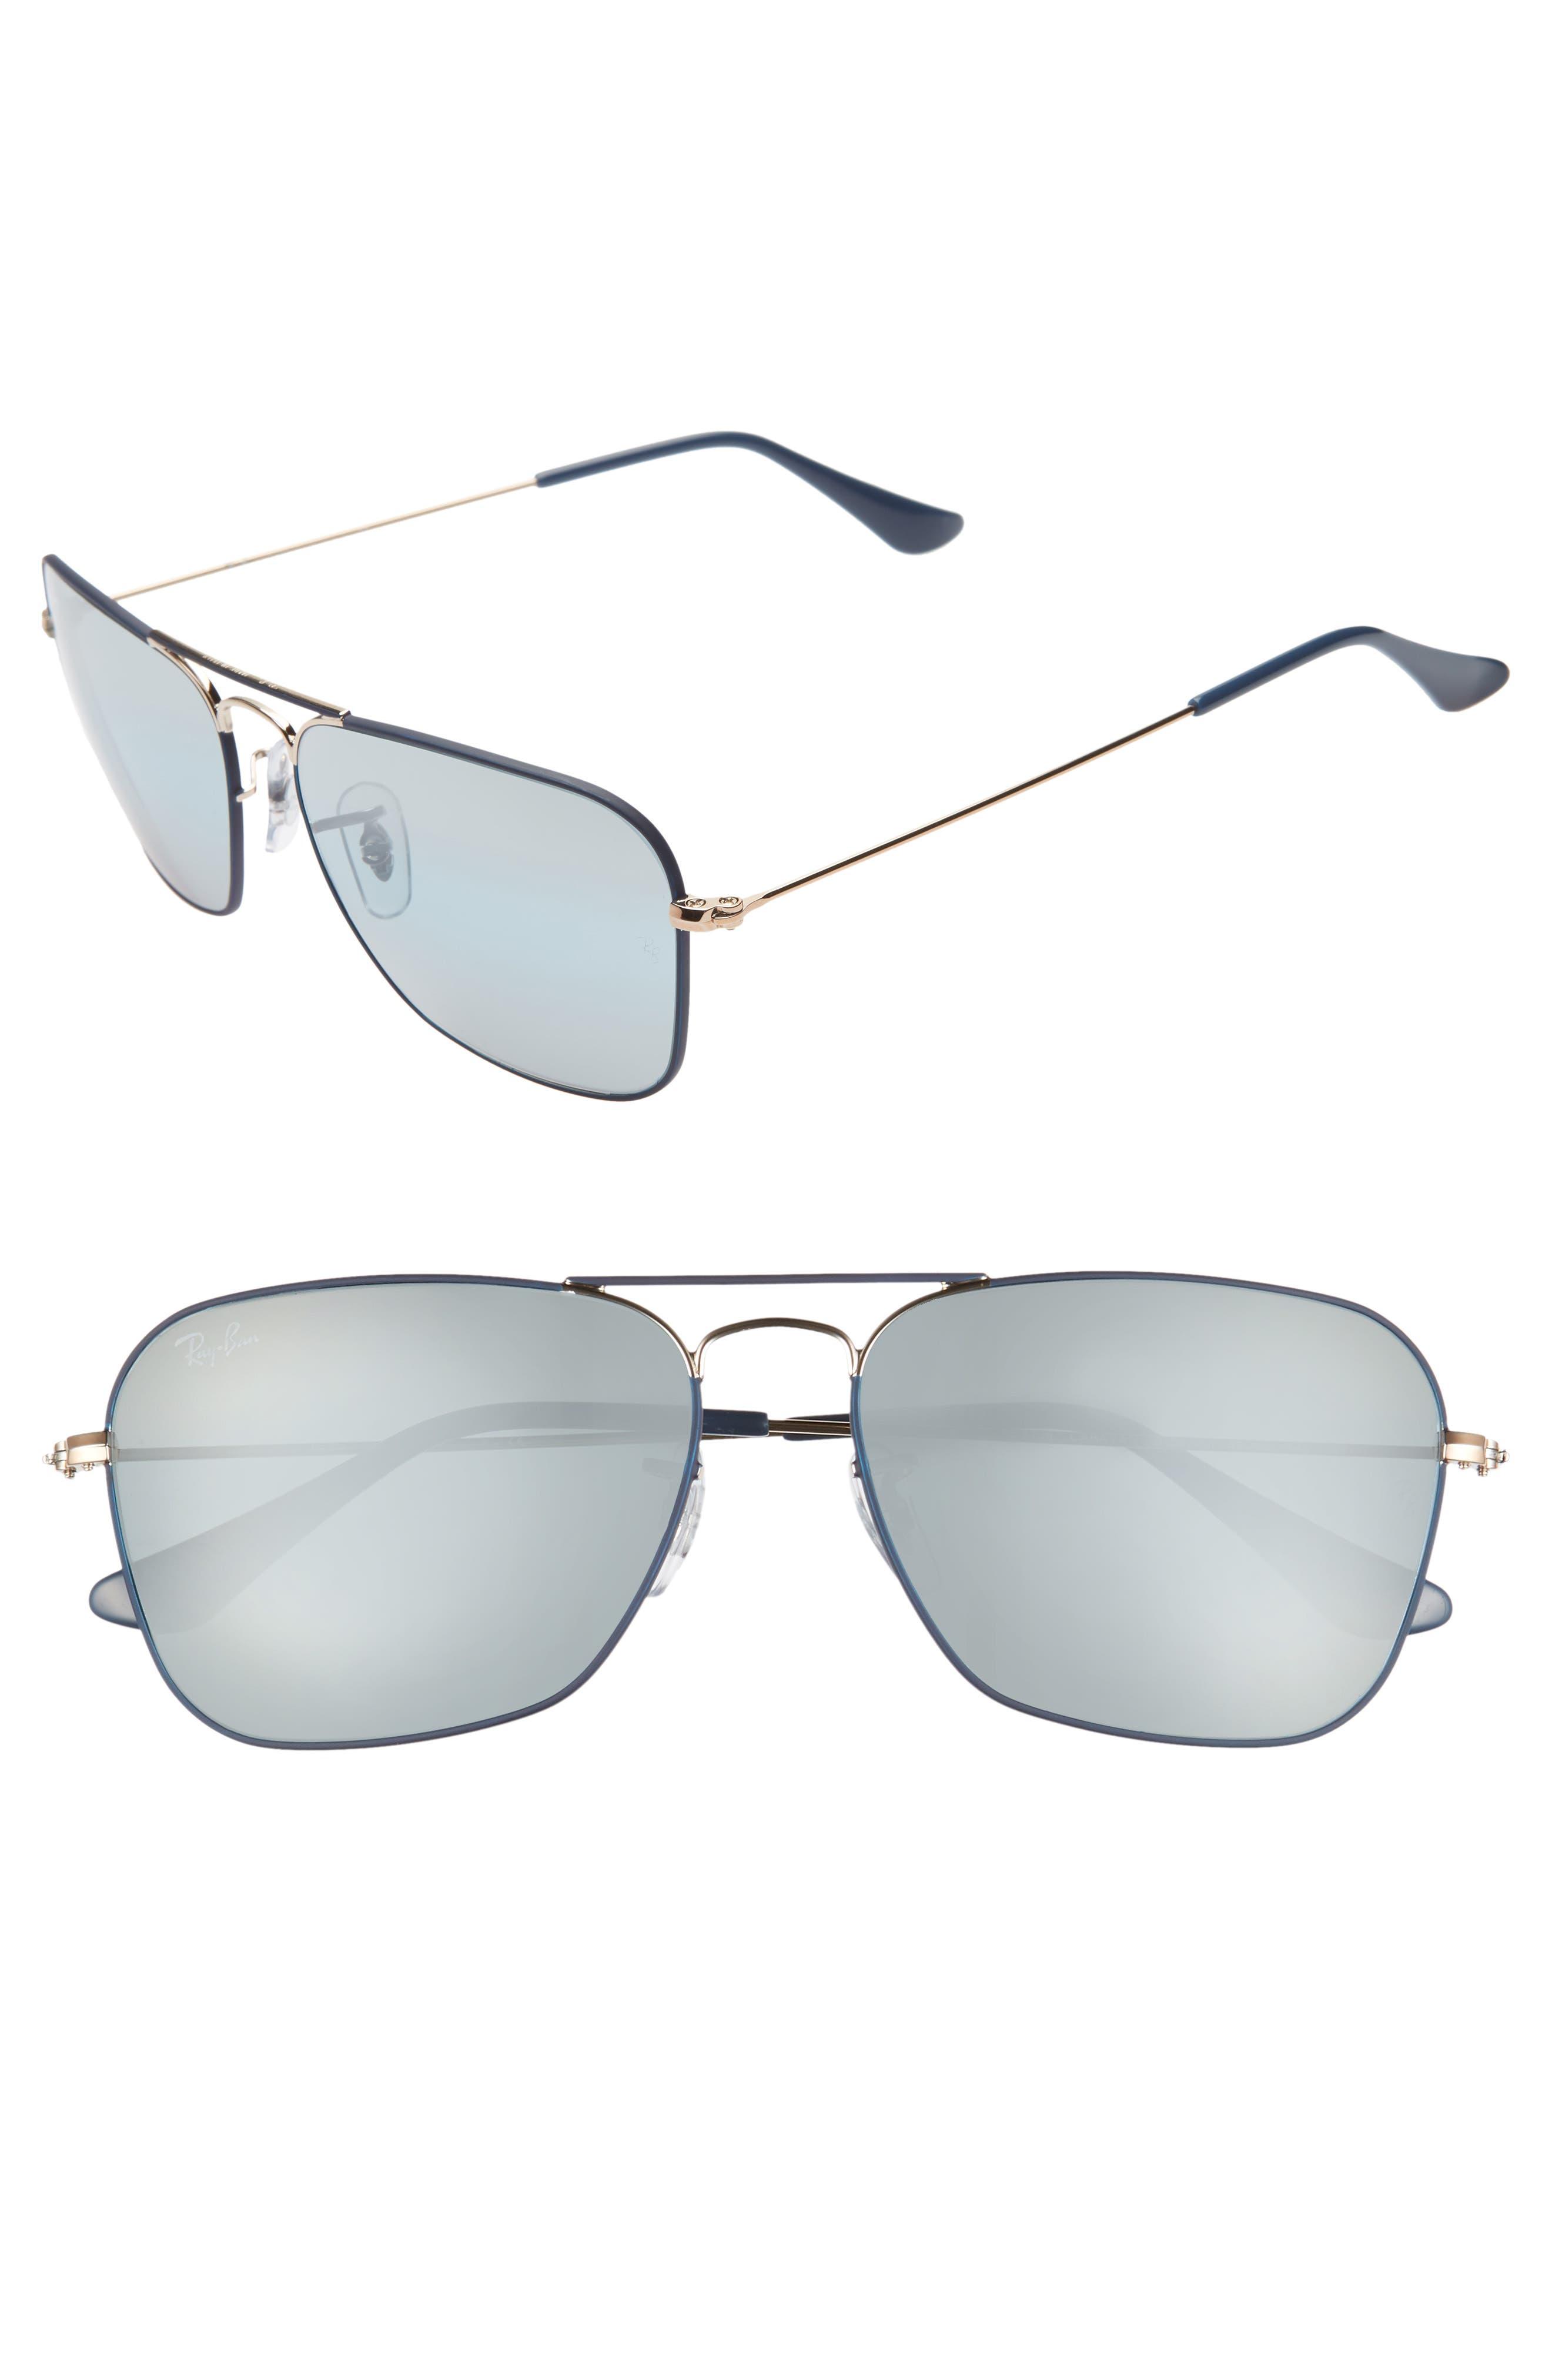 Ray-Ban 5m Aviator Sunglasses - Dark Blue/ Gold Mirror